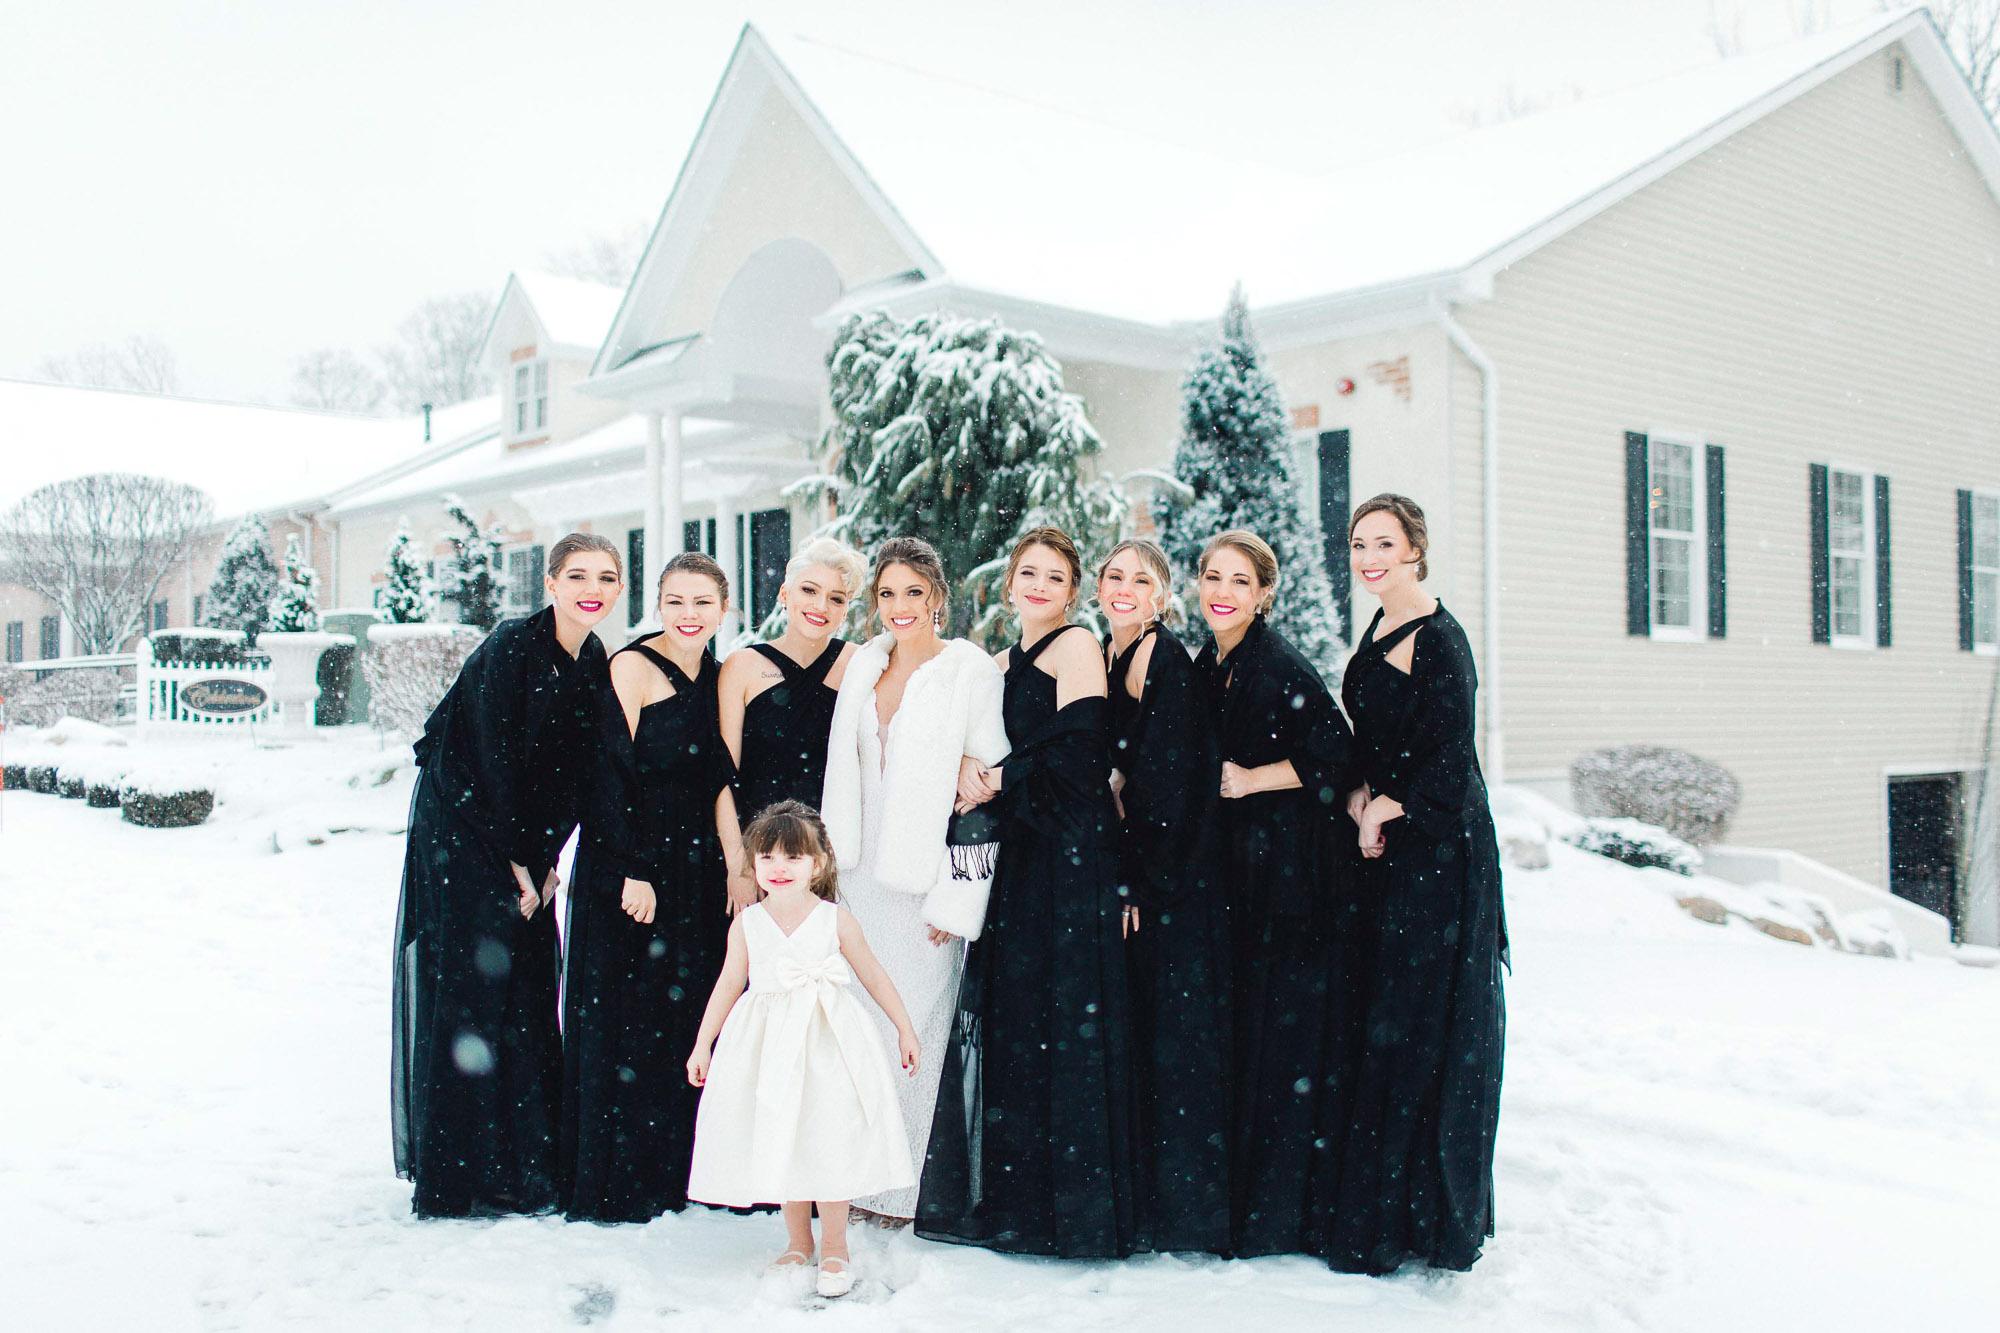 snowy-sand-springs-country-club-drums-pa-christmas-wedding-34543.jpg